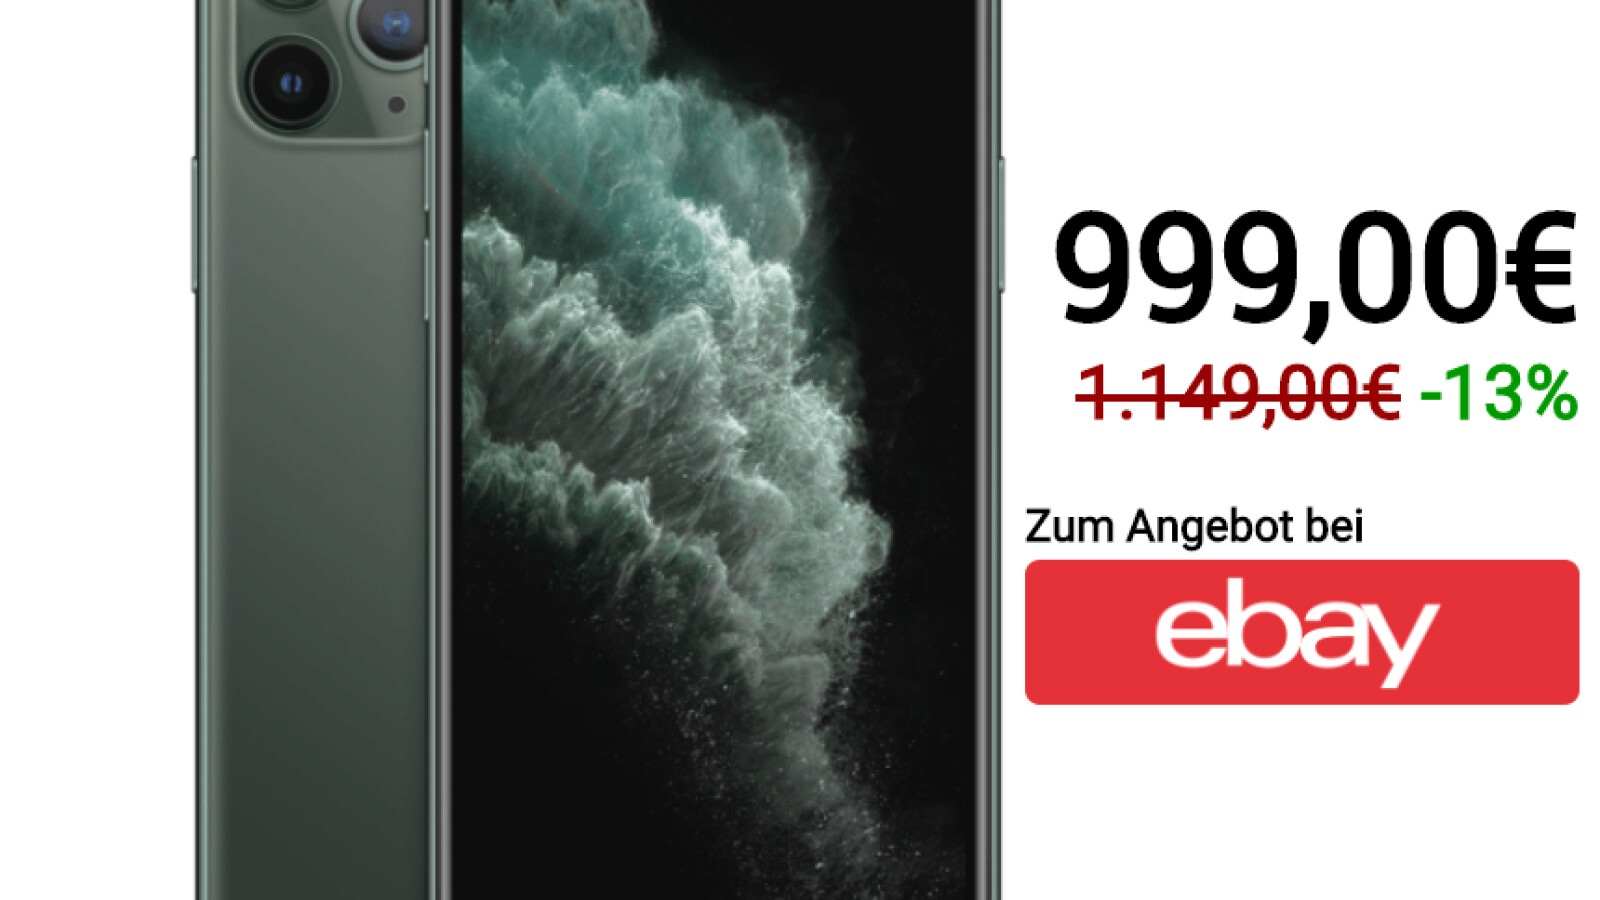 Apple Iphone 11 Pro Zum Cyber Monday Bei Ebay Als Mega